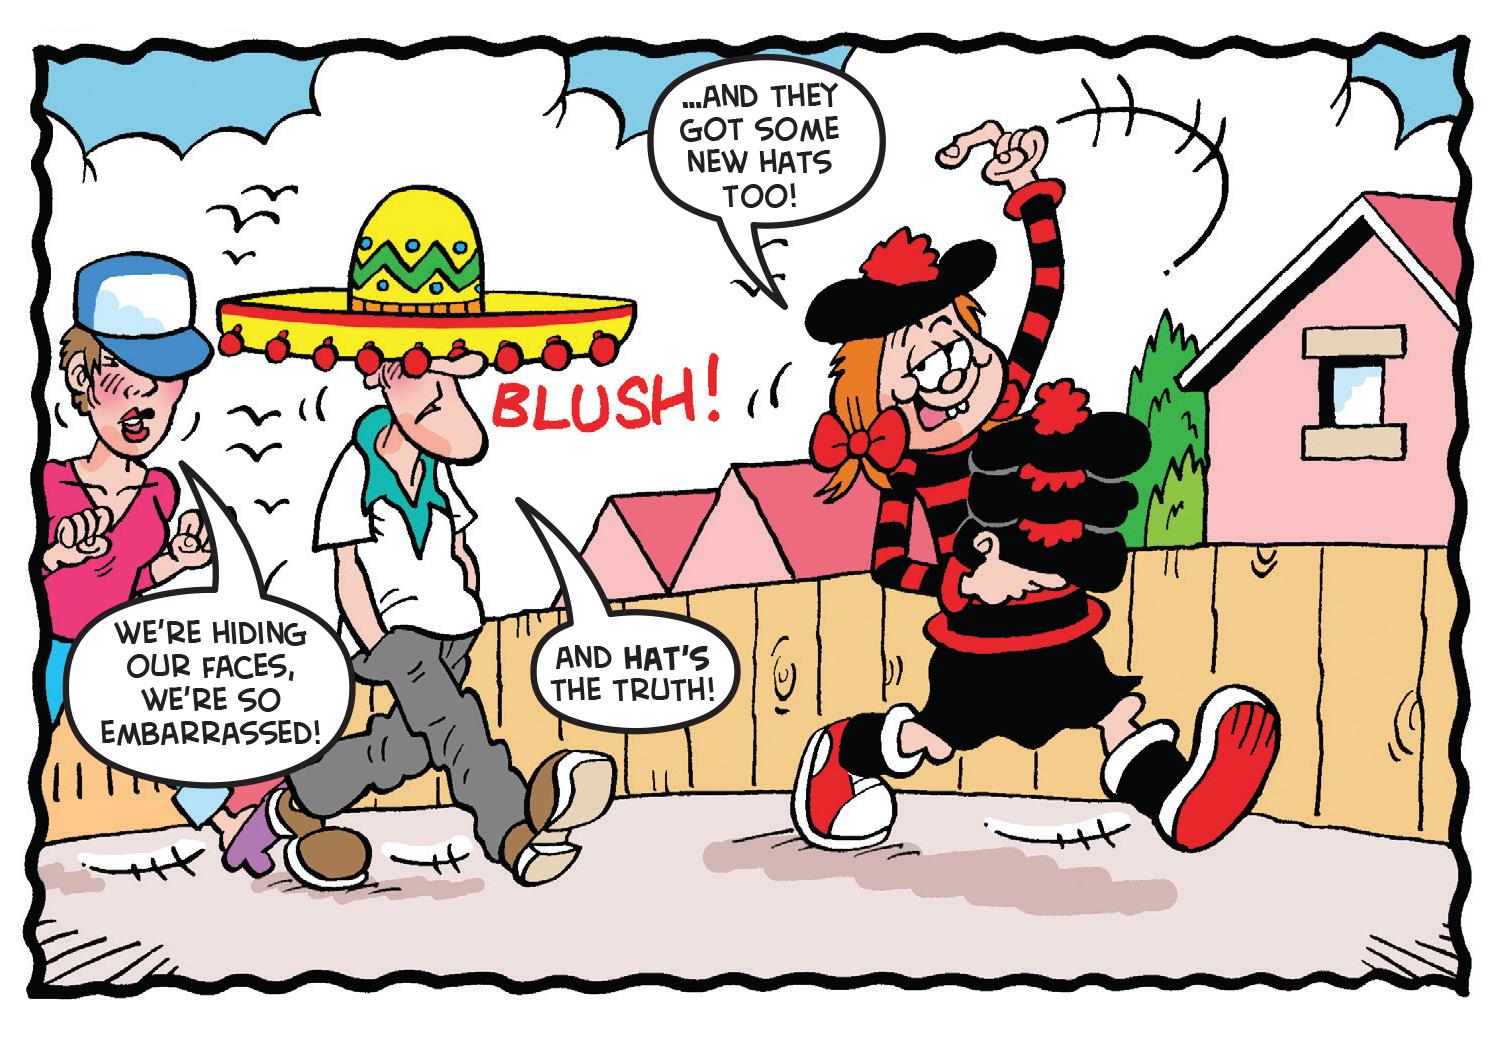 Hats off to Minnie the Minx